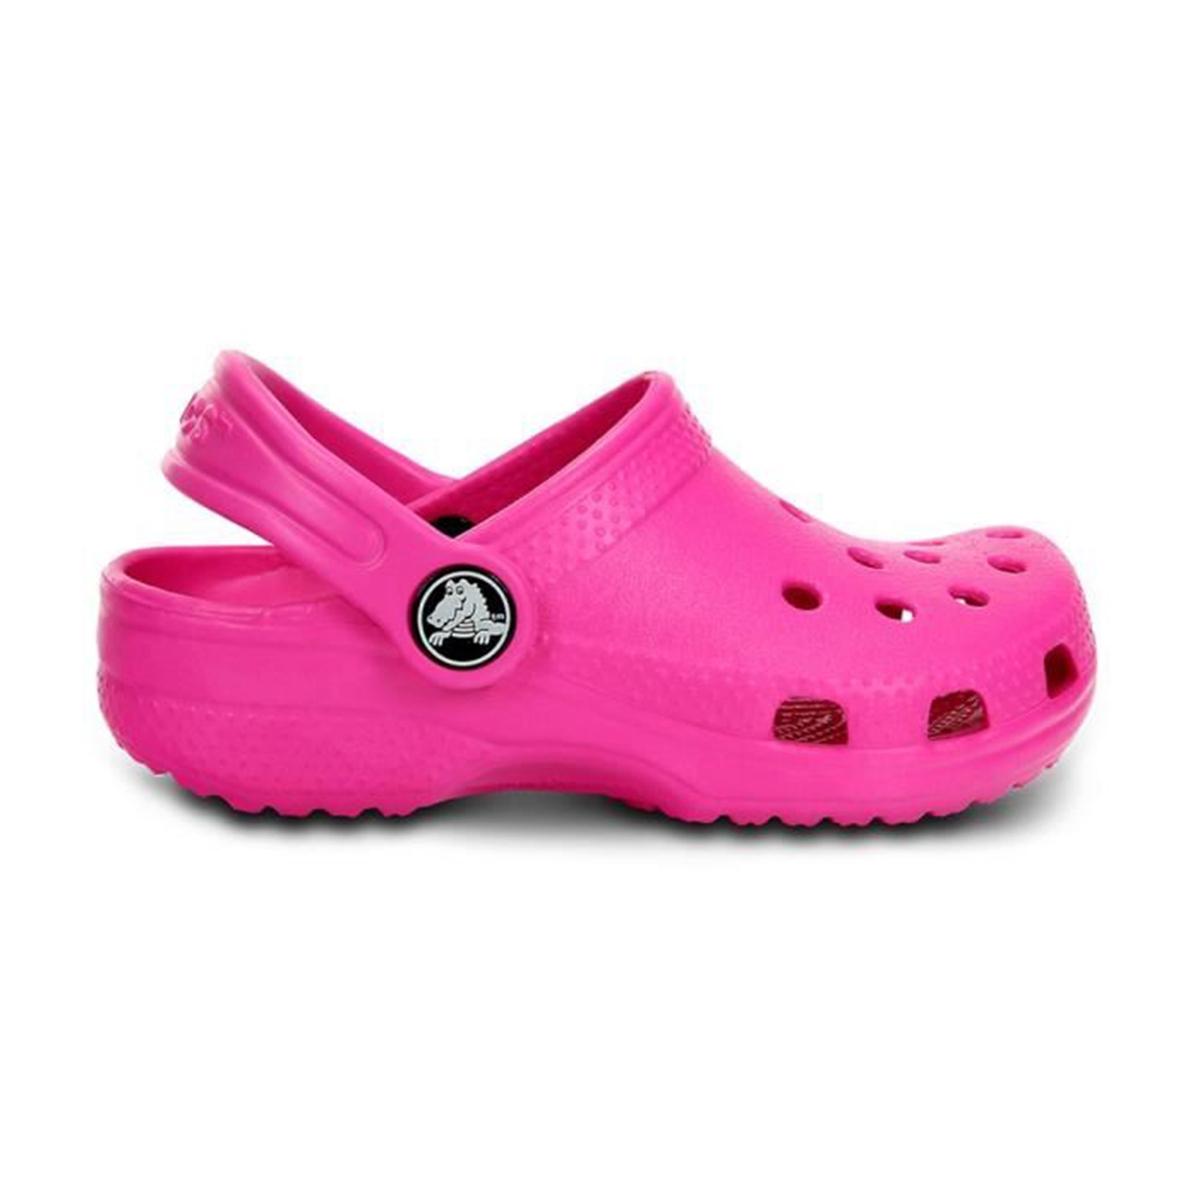 Сабо Classic Clog Kids crocs сабо kids' swiftwater clog для мальчика crocs